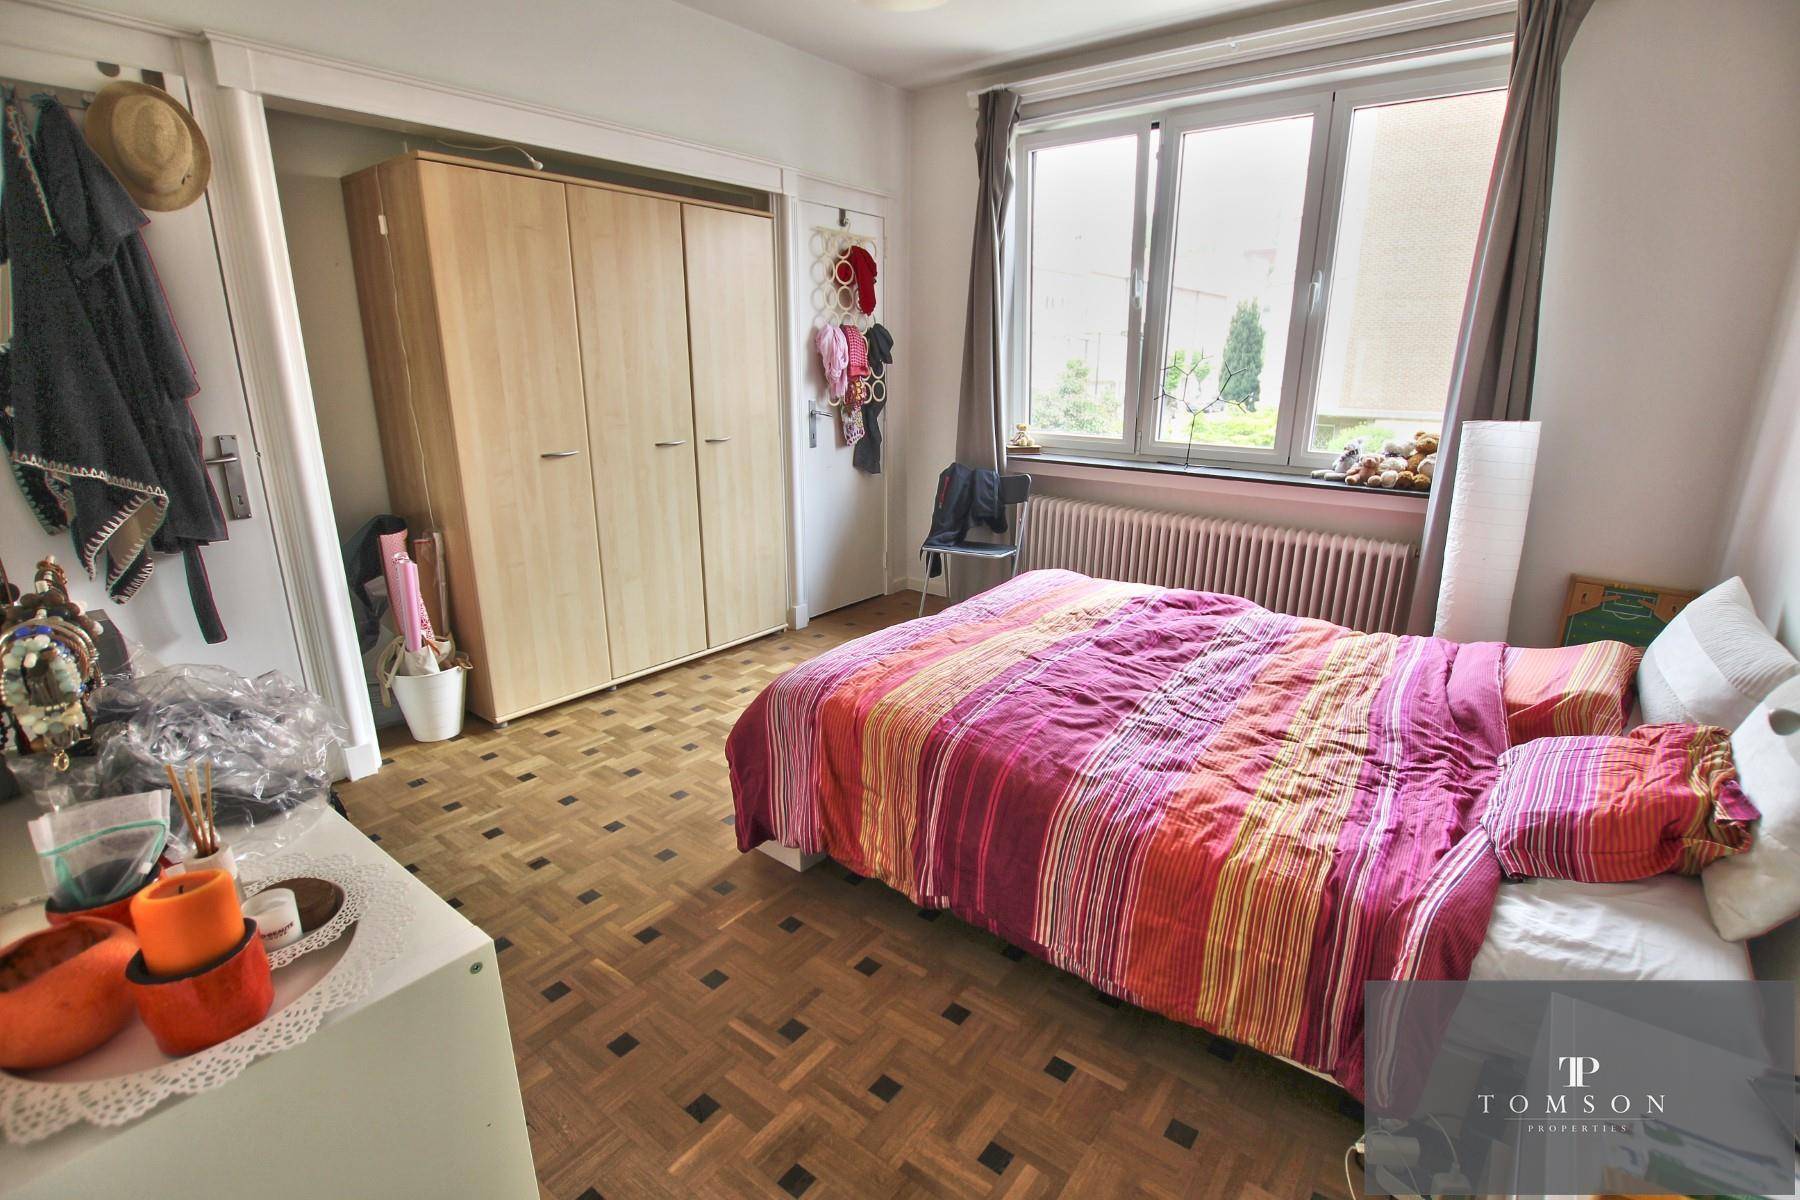 Appartement exceptionnel - Woluwe-Saint-Pierre - #4324789-6